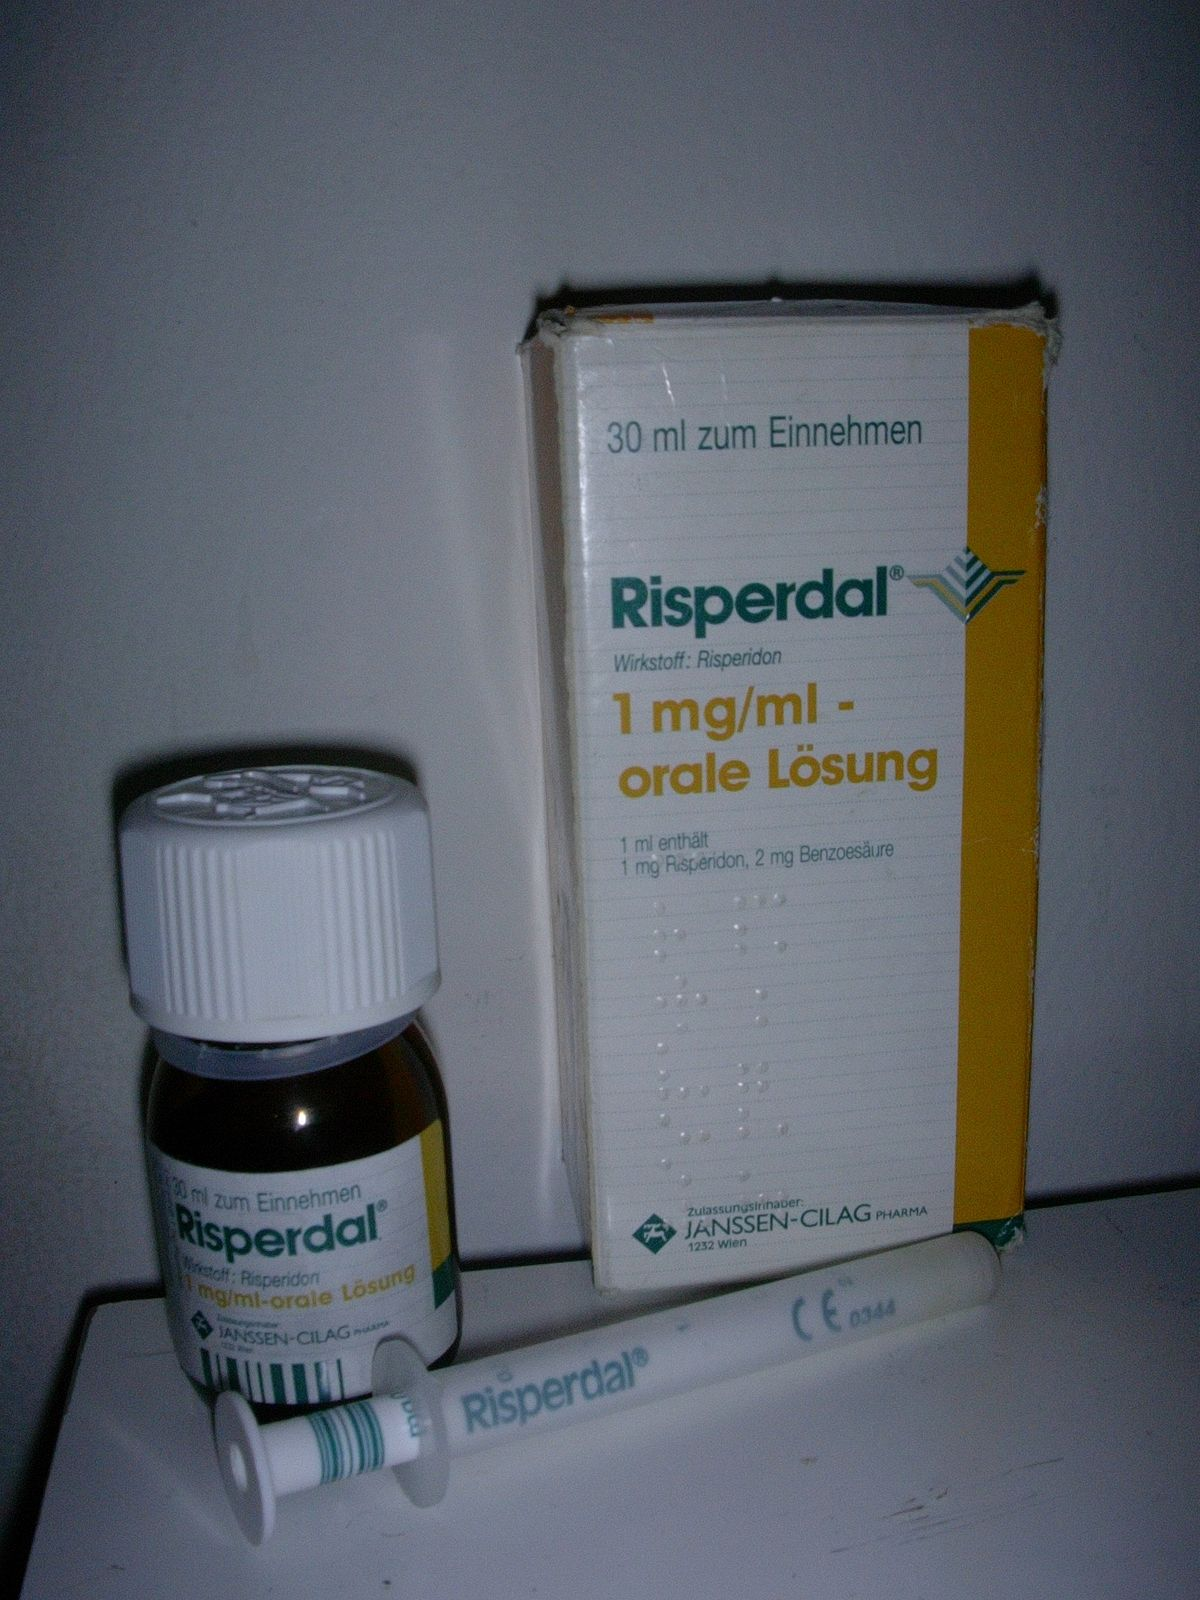 File:Risperdal oral solution.JPG - Wikimedia Commons